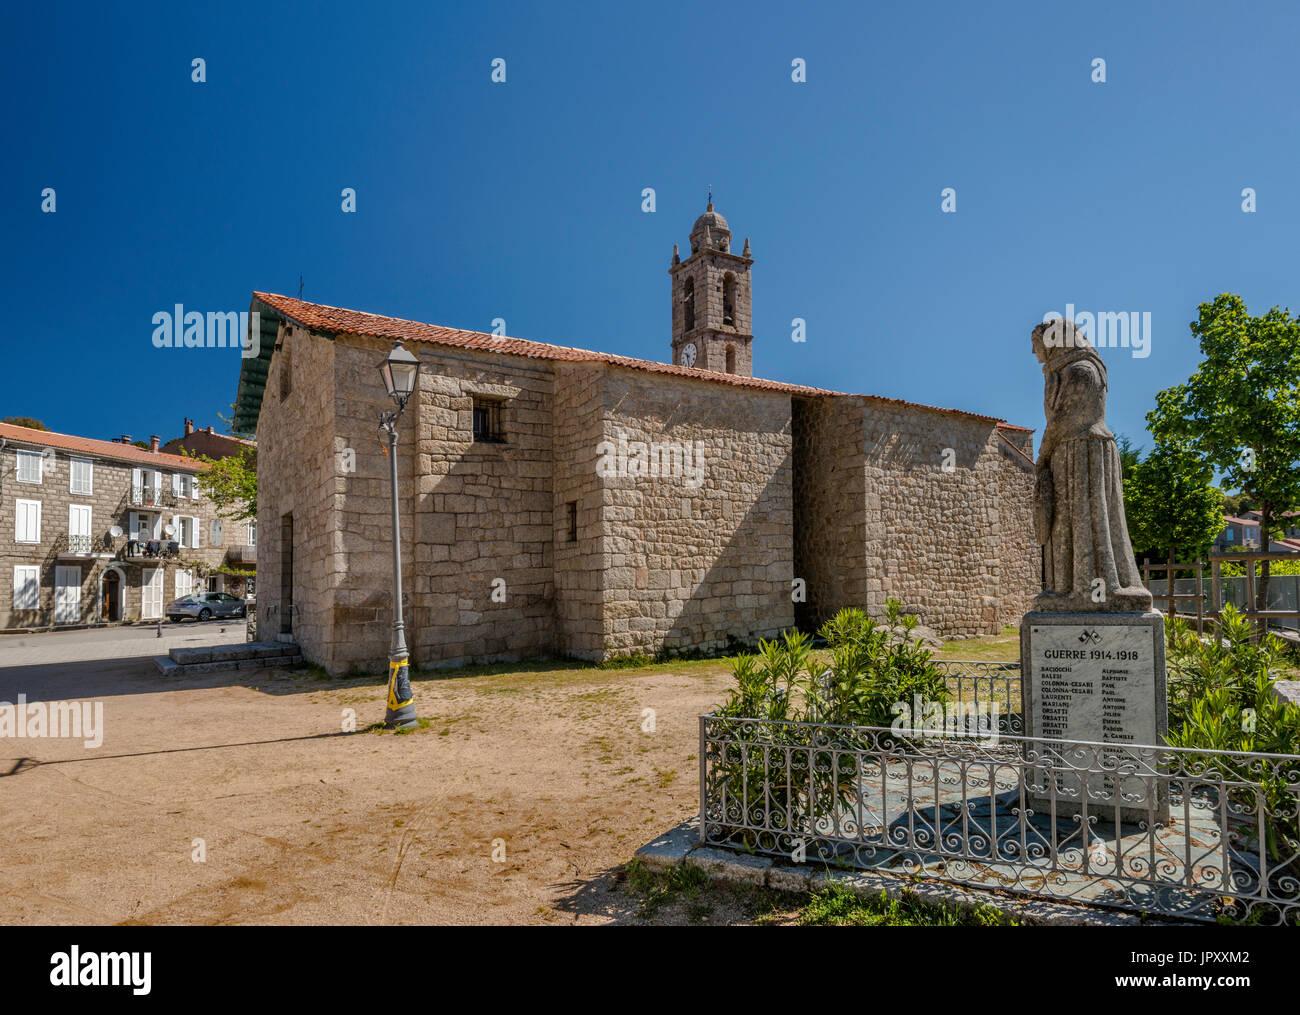 World War 1 Memorial, Church of Saint-Nicolas, 19th century, in Aullene, Alta Rocca microregion, Corse-du-Sud, Corsica, France - Stock Image